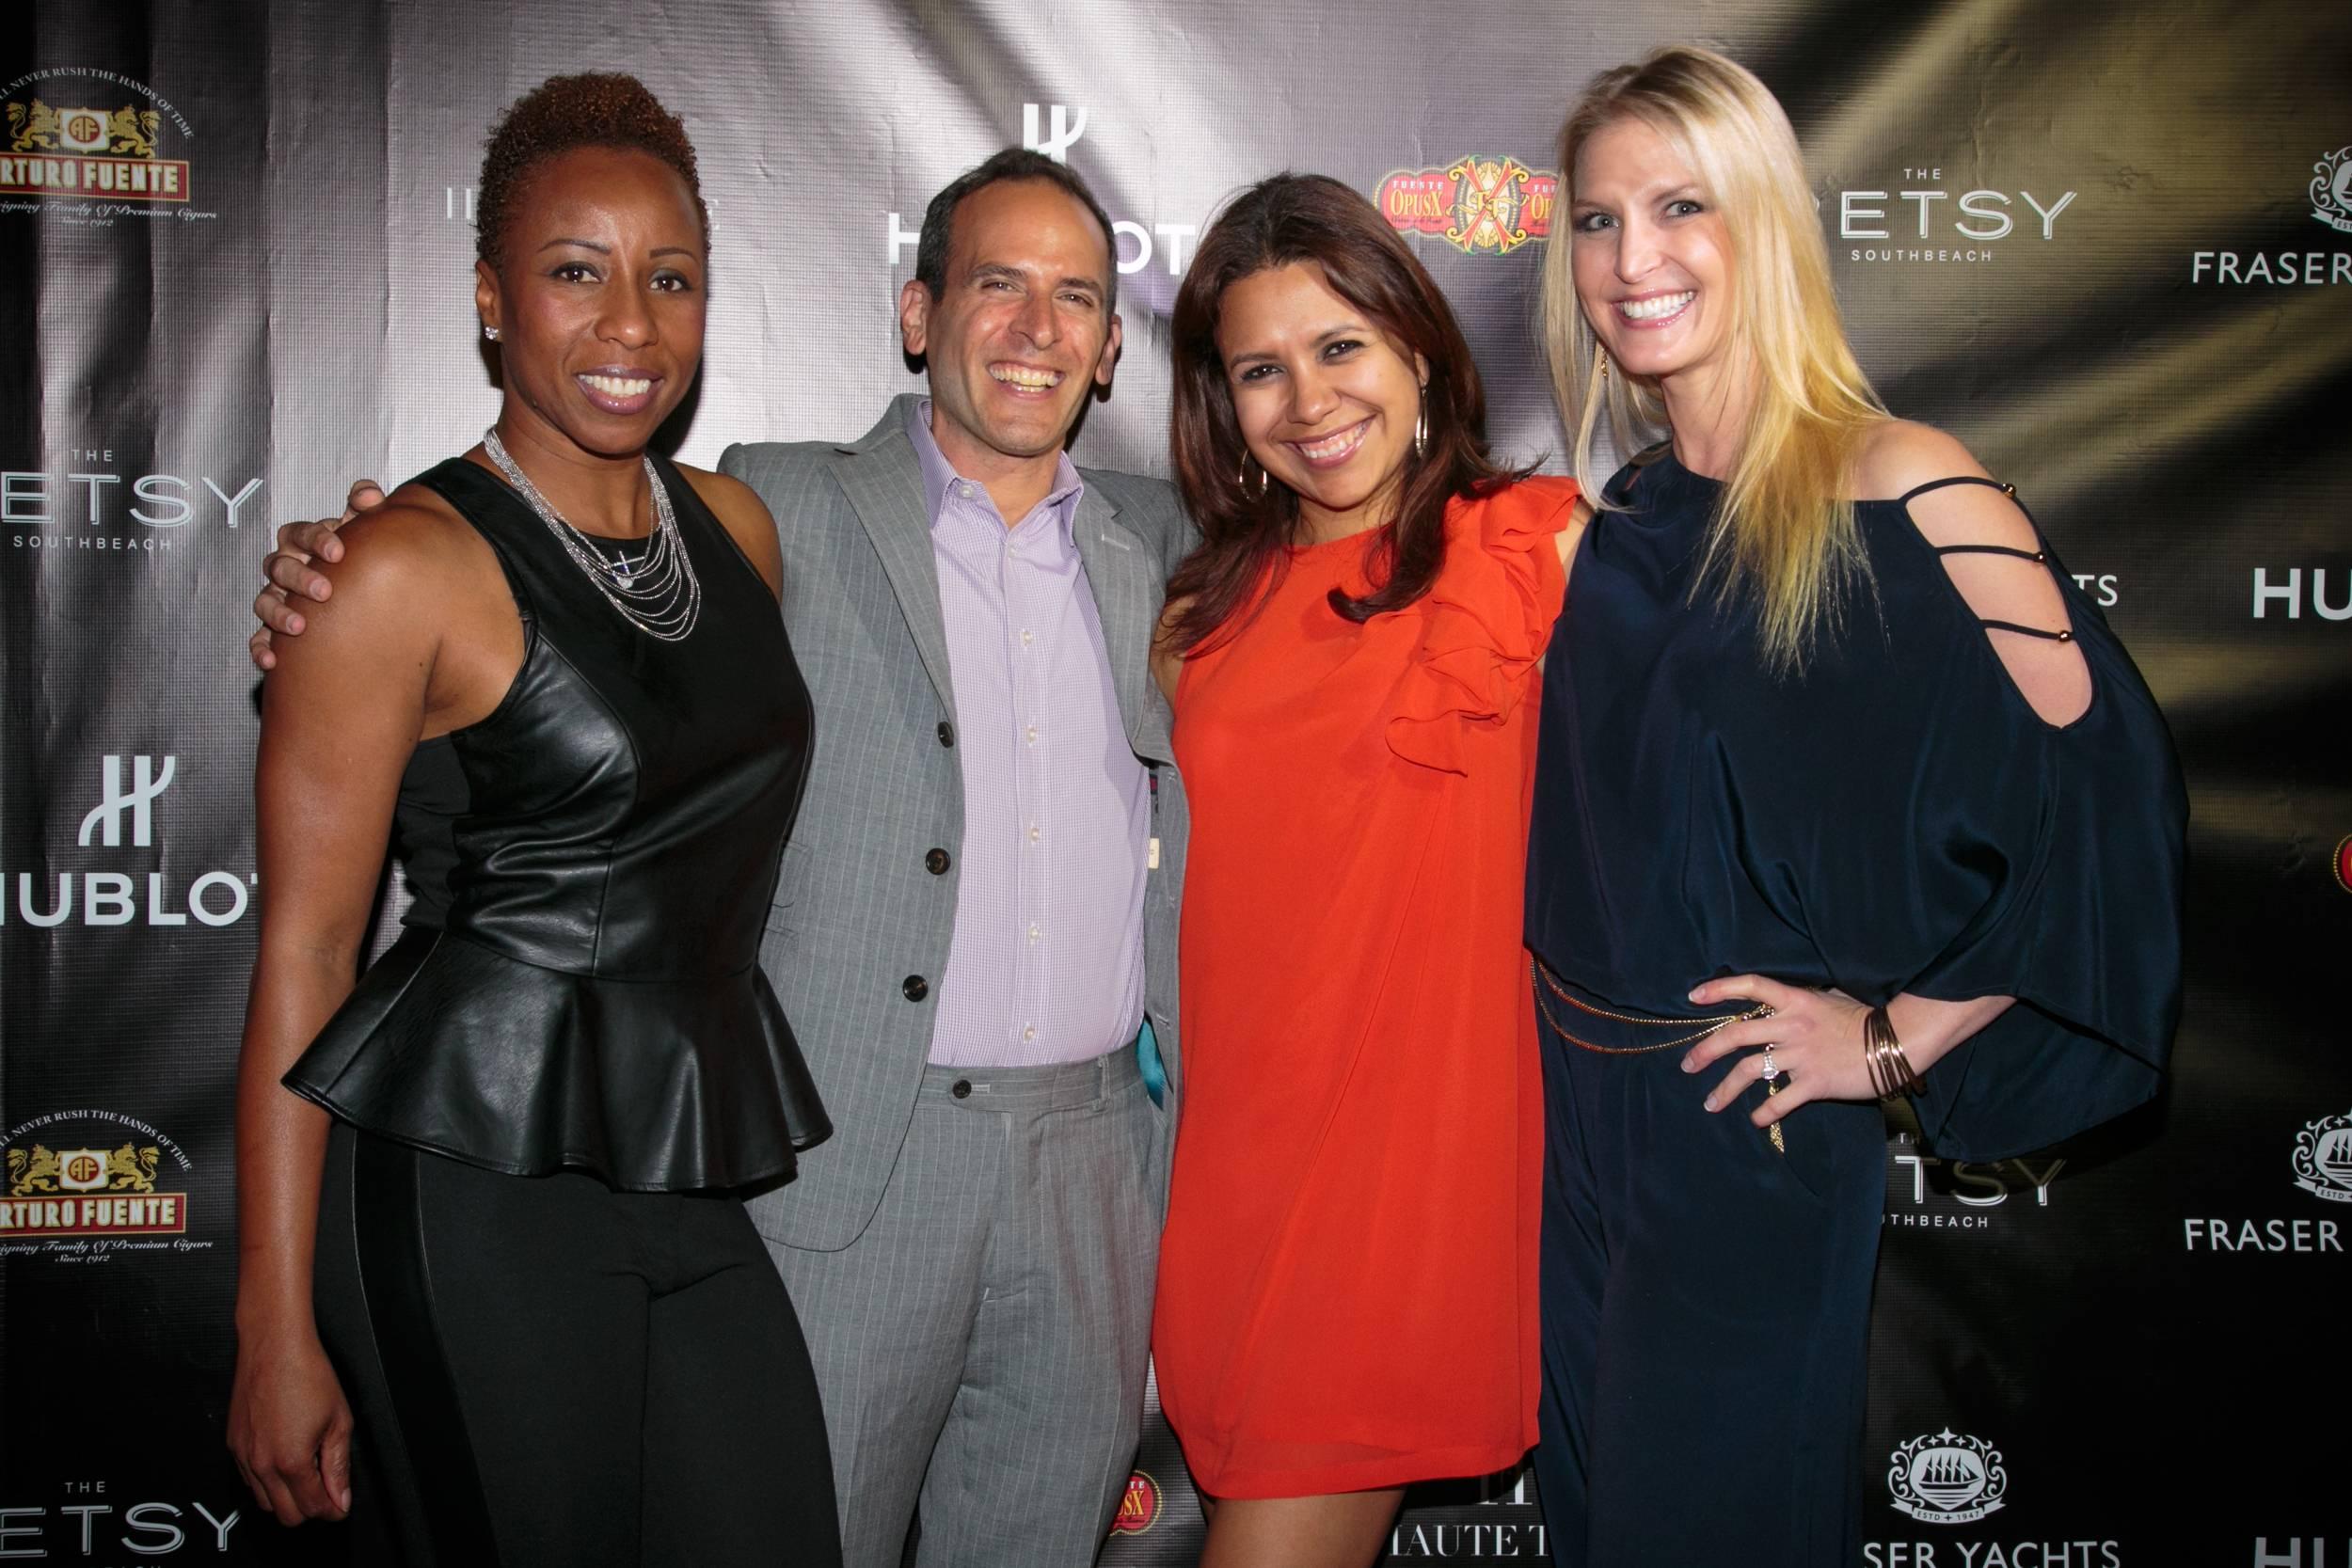 Marva Bradshaw, Oren Agai and Soraya Ramirez w Hublot and Kari Webber w Fraser Yachts